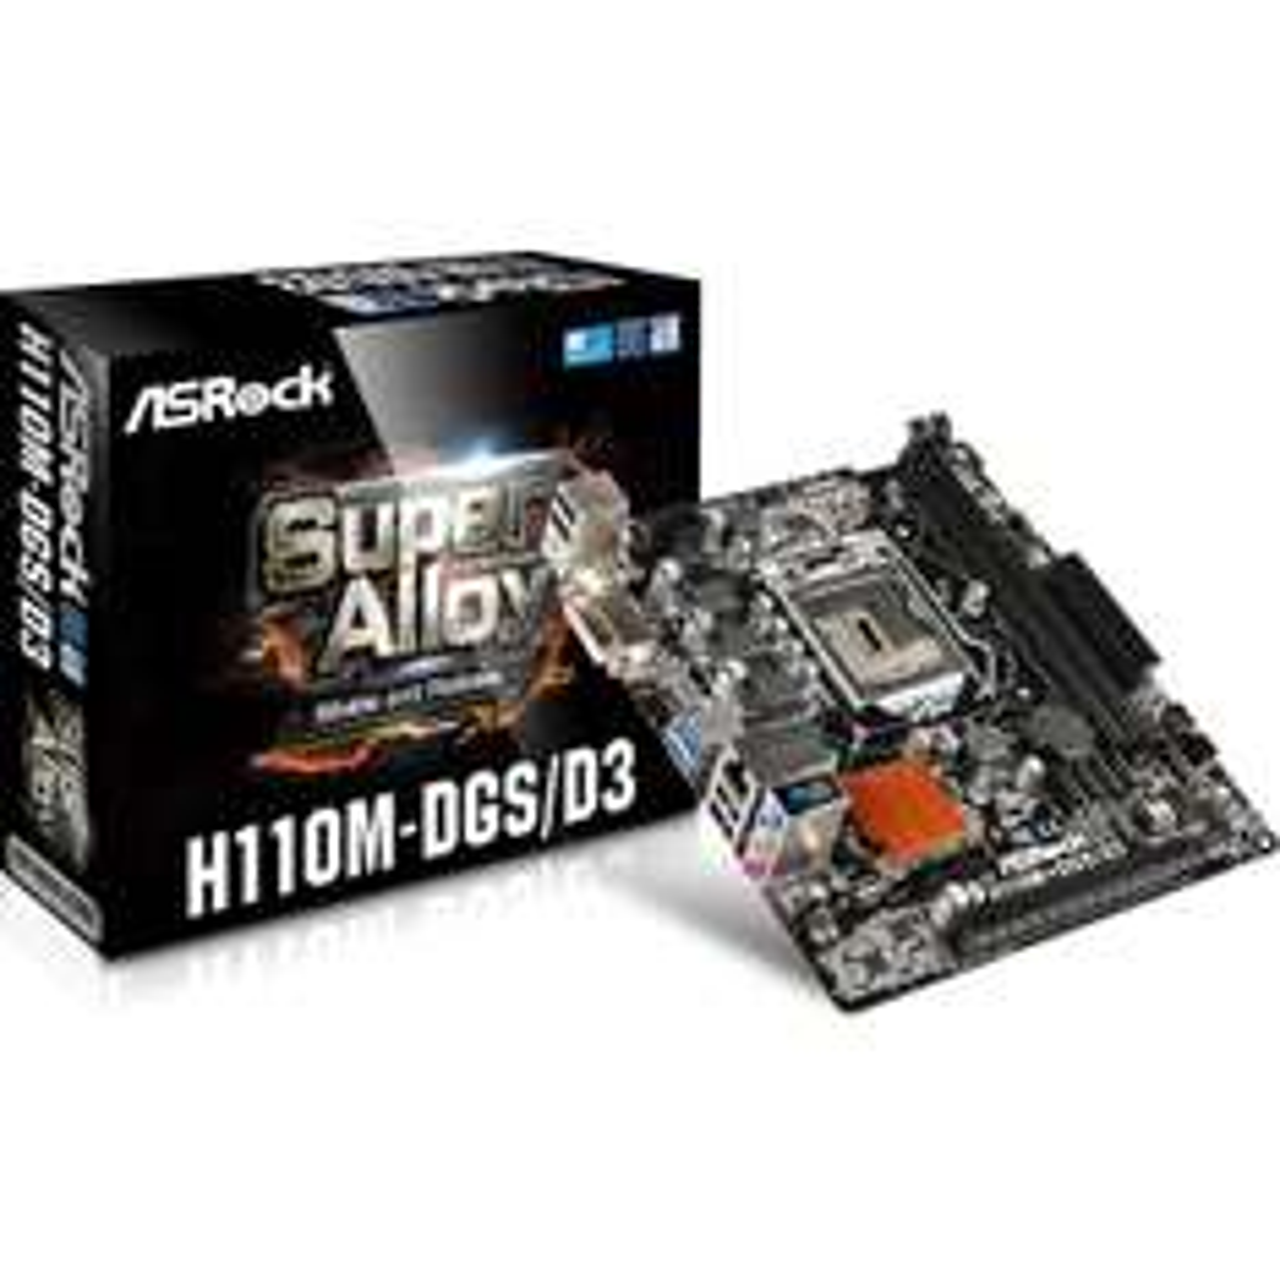 ASRock H110M-DGS/D3 Intel H110 So.1151 INTEL SKYLAKE für 29,00 im Mindstar